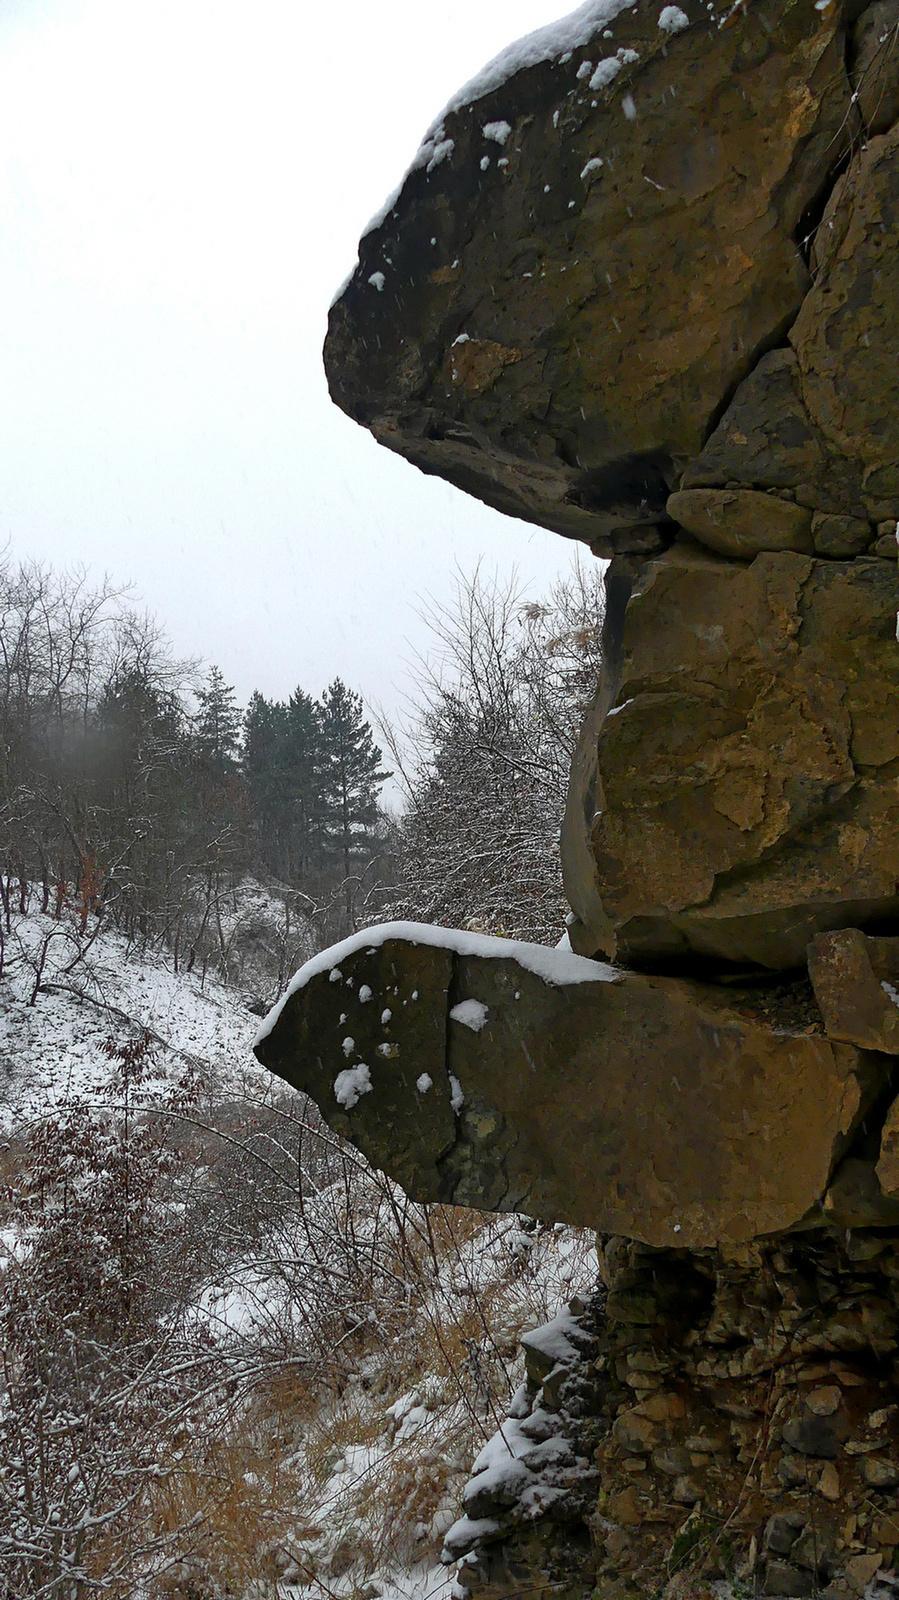 07 Tél a Medvesen